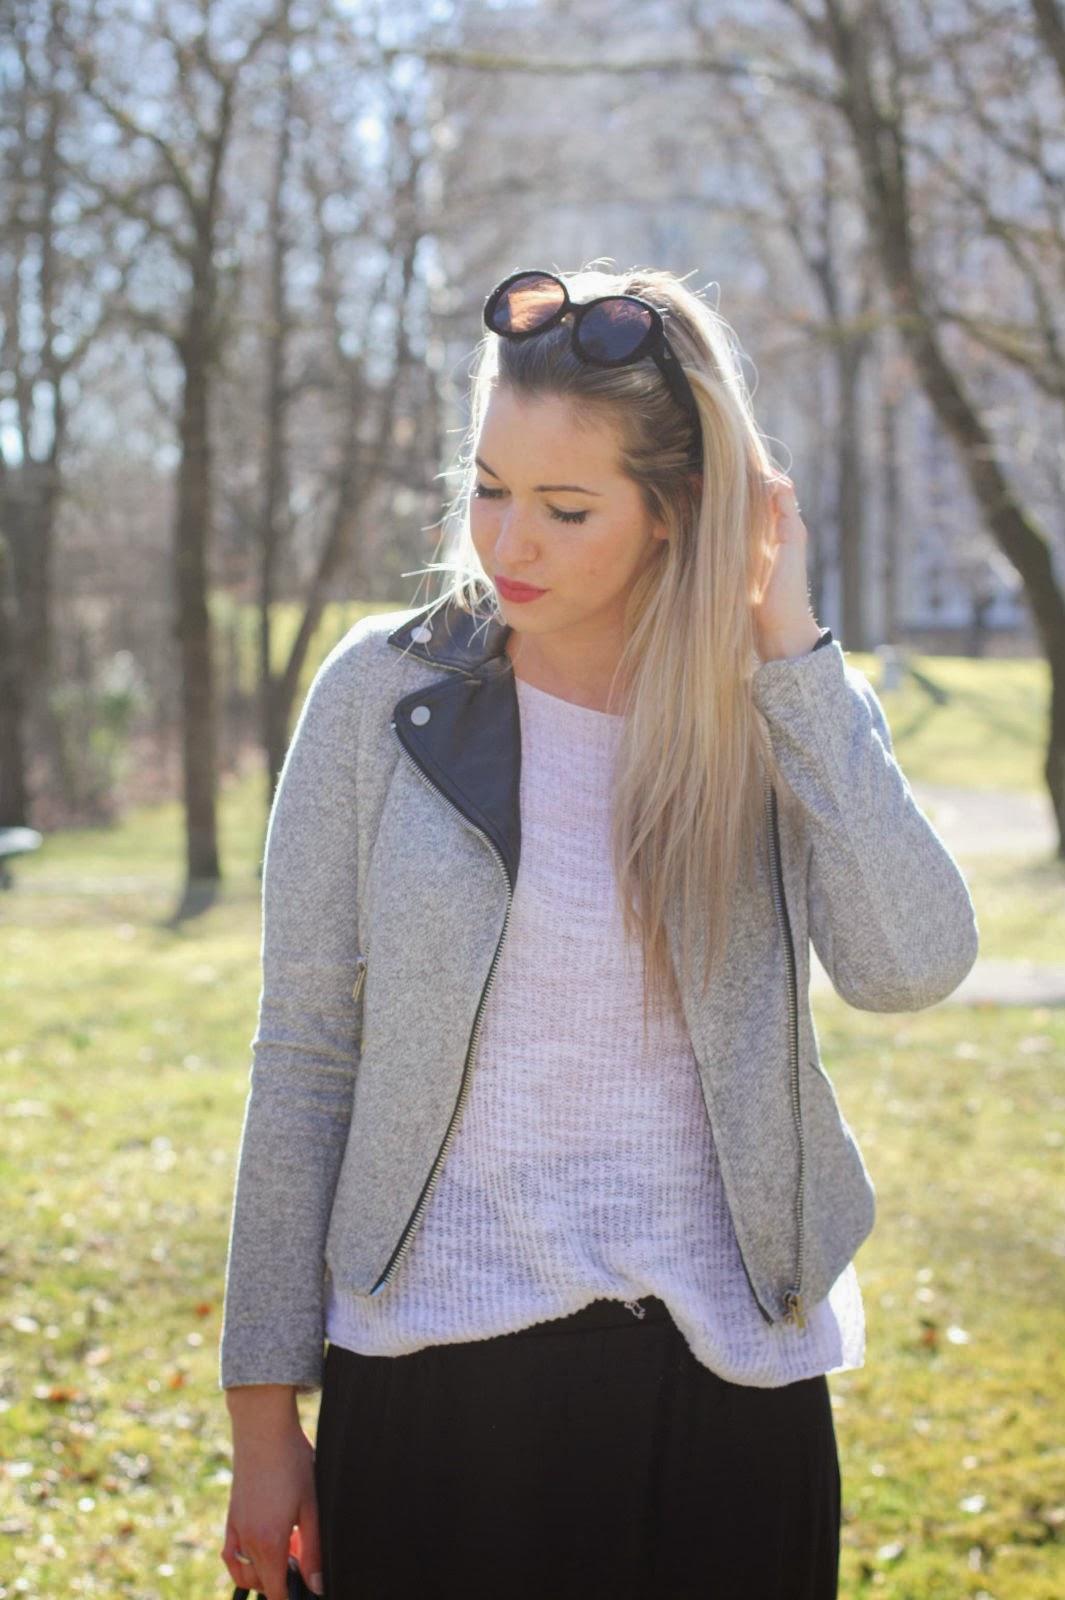 Maxiskirt, Maxirock, Modeblog, Fashionblog, Fashion Blog, Patrizia Paul, The Paste Blog, thepasteblog